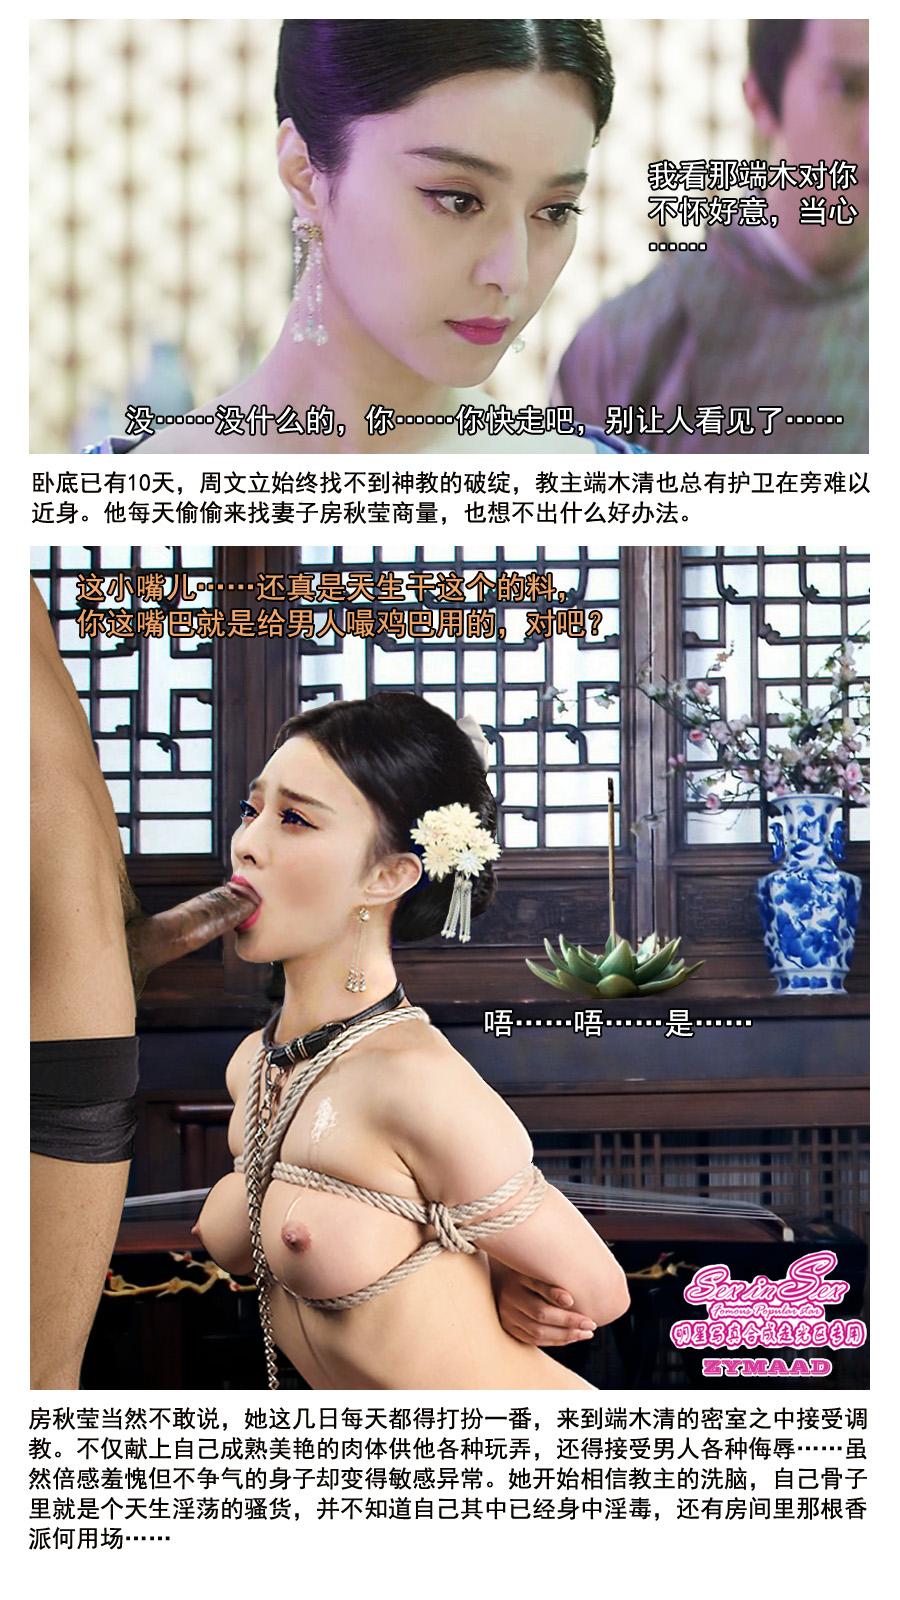 sexinsex zymaad 空姐 景甜 人気検索 HOT SEARCHs